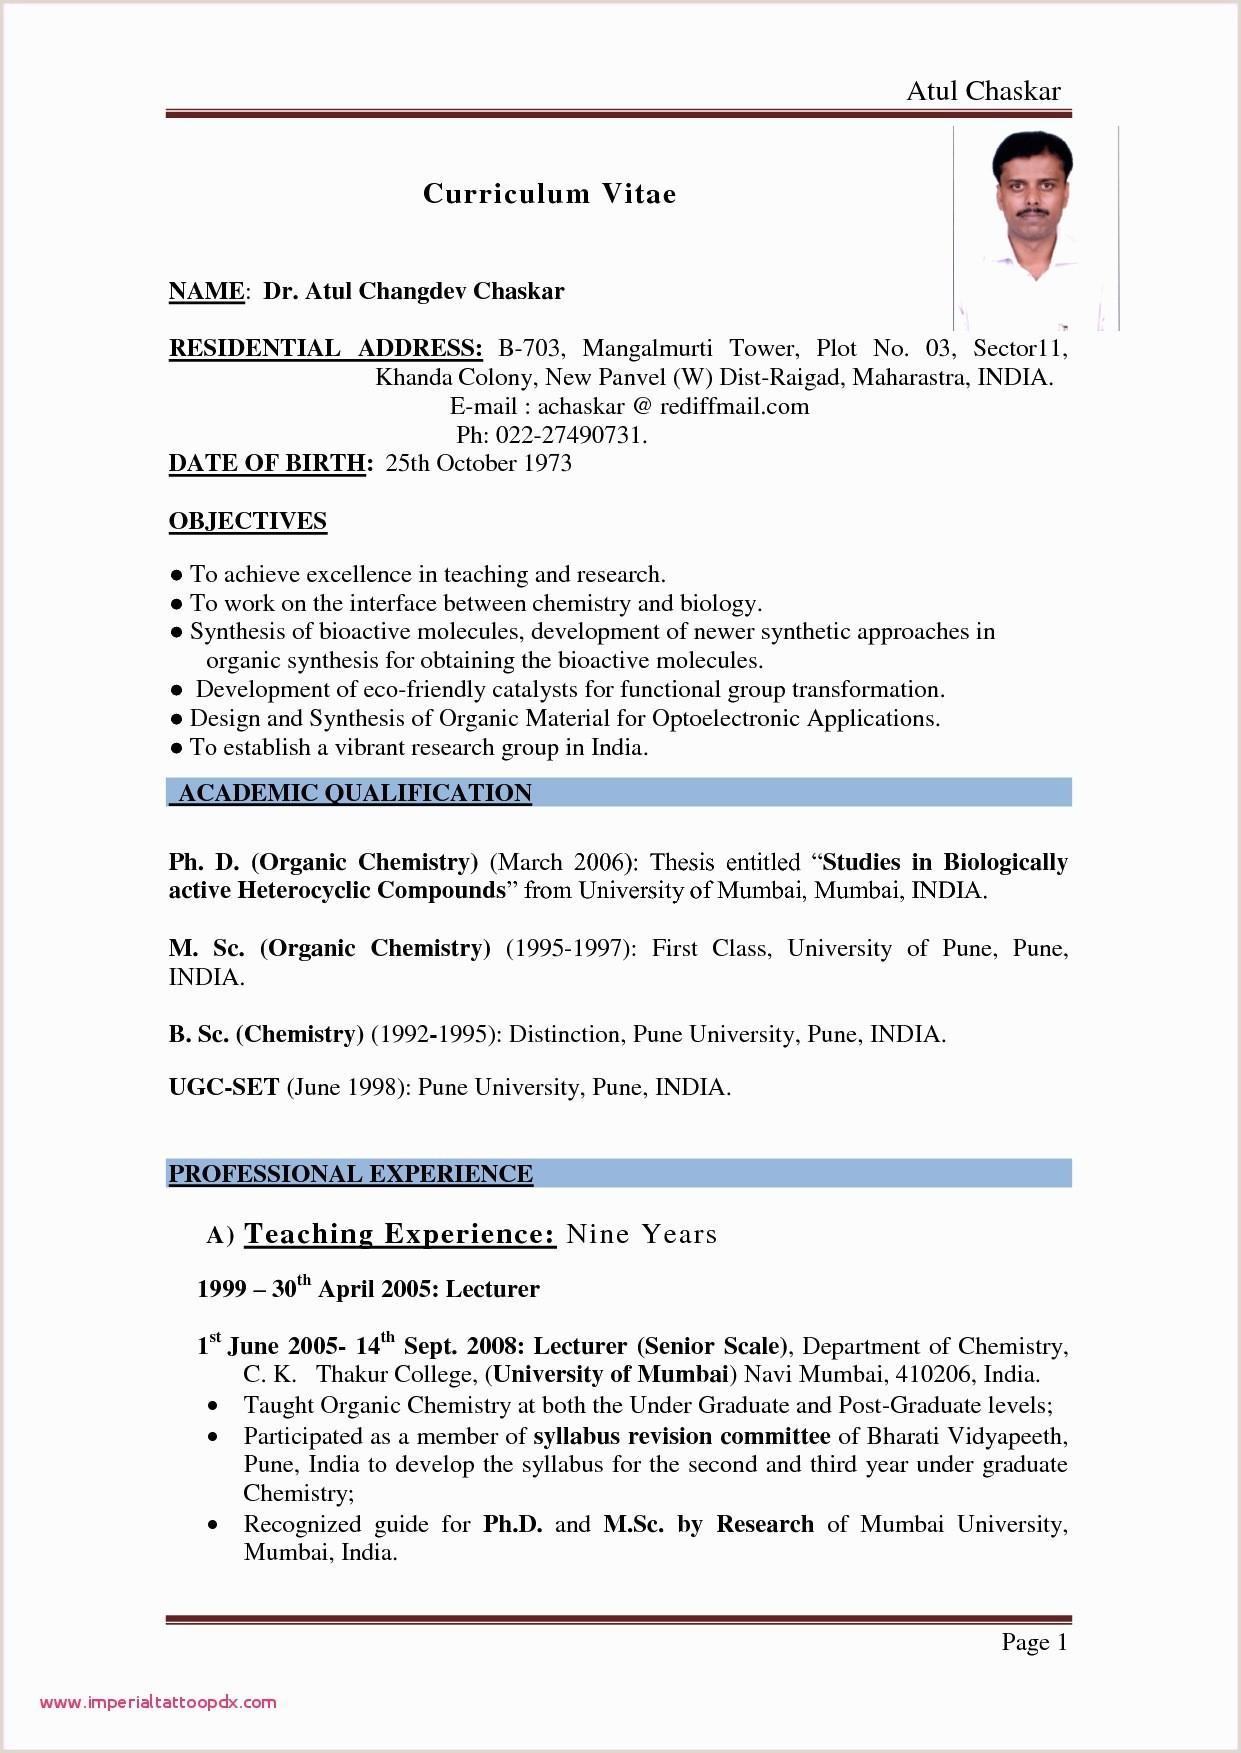 english teacher resume samples Sofasdocsurvey